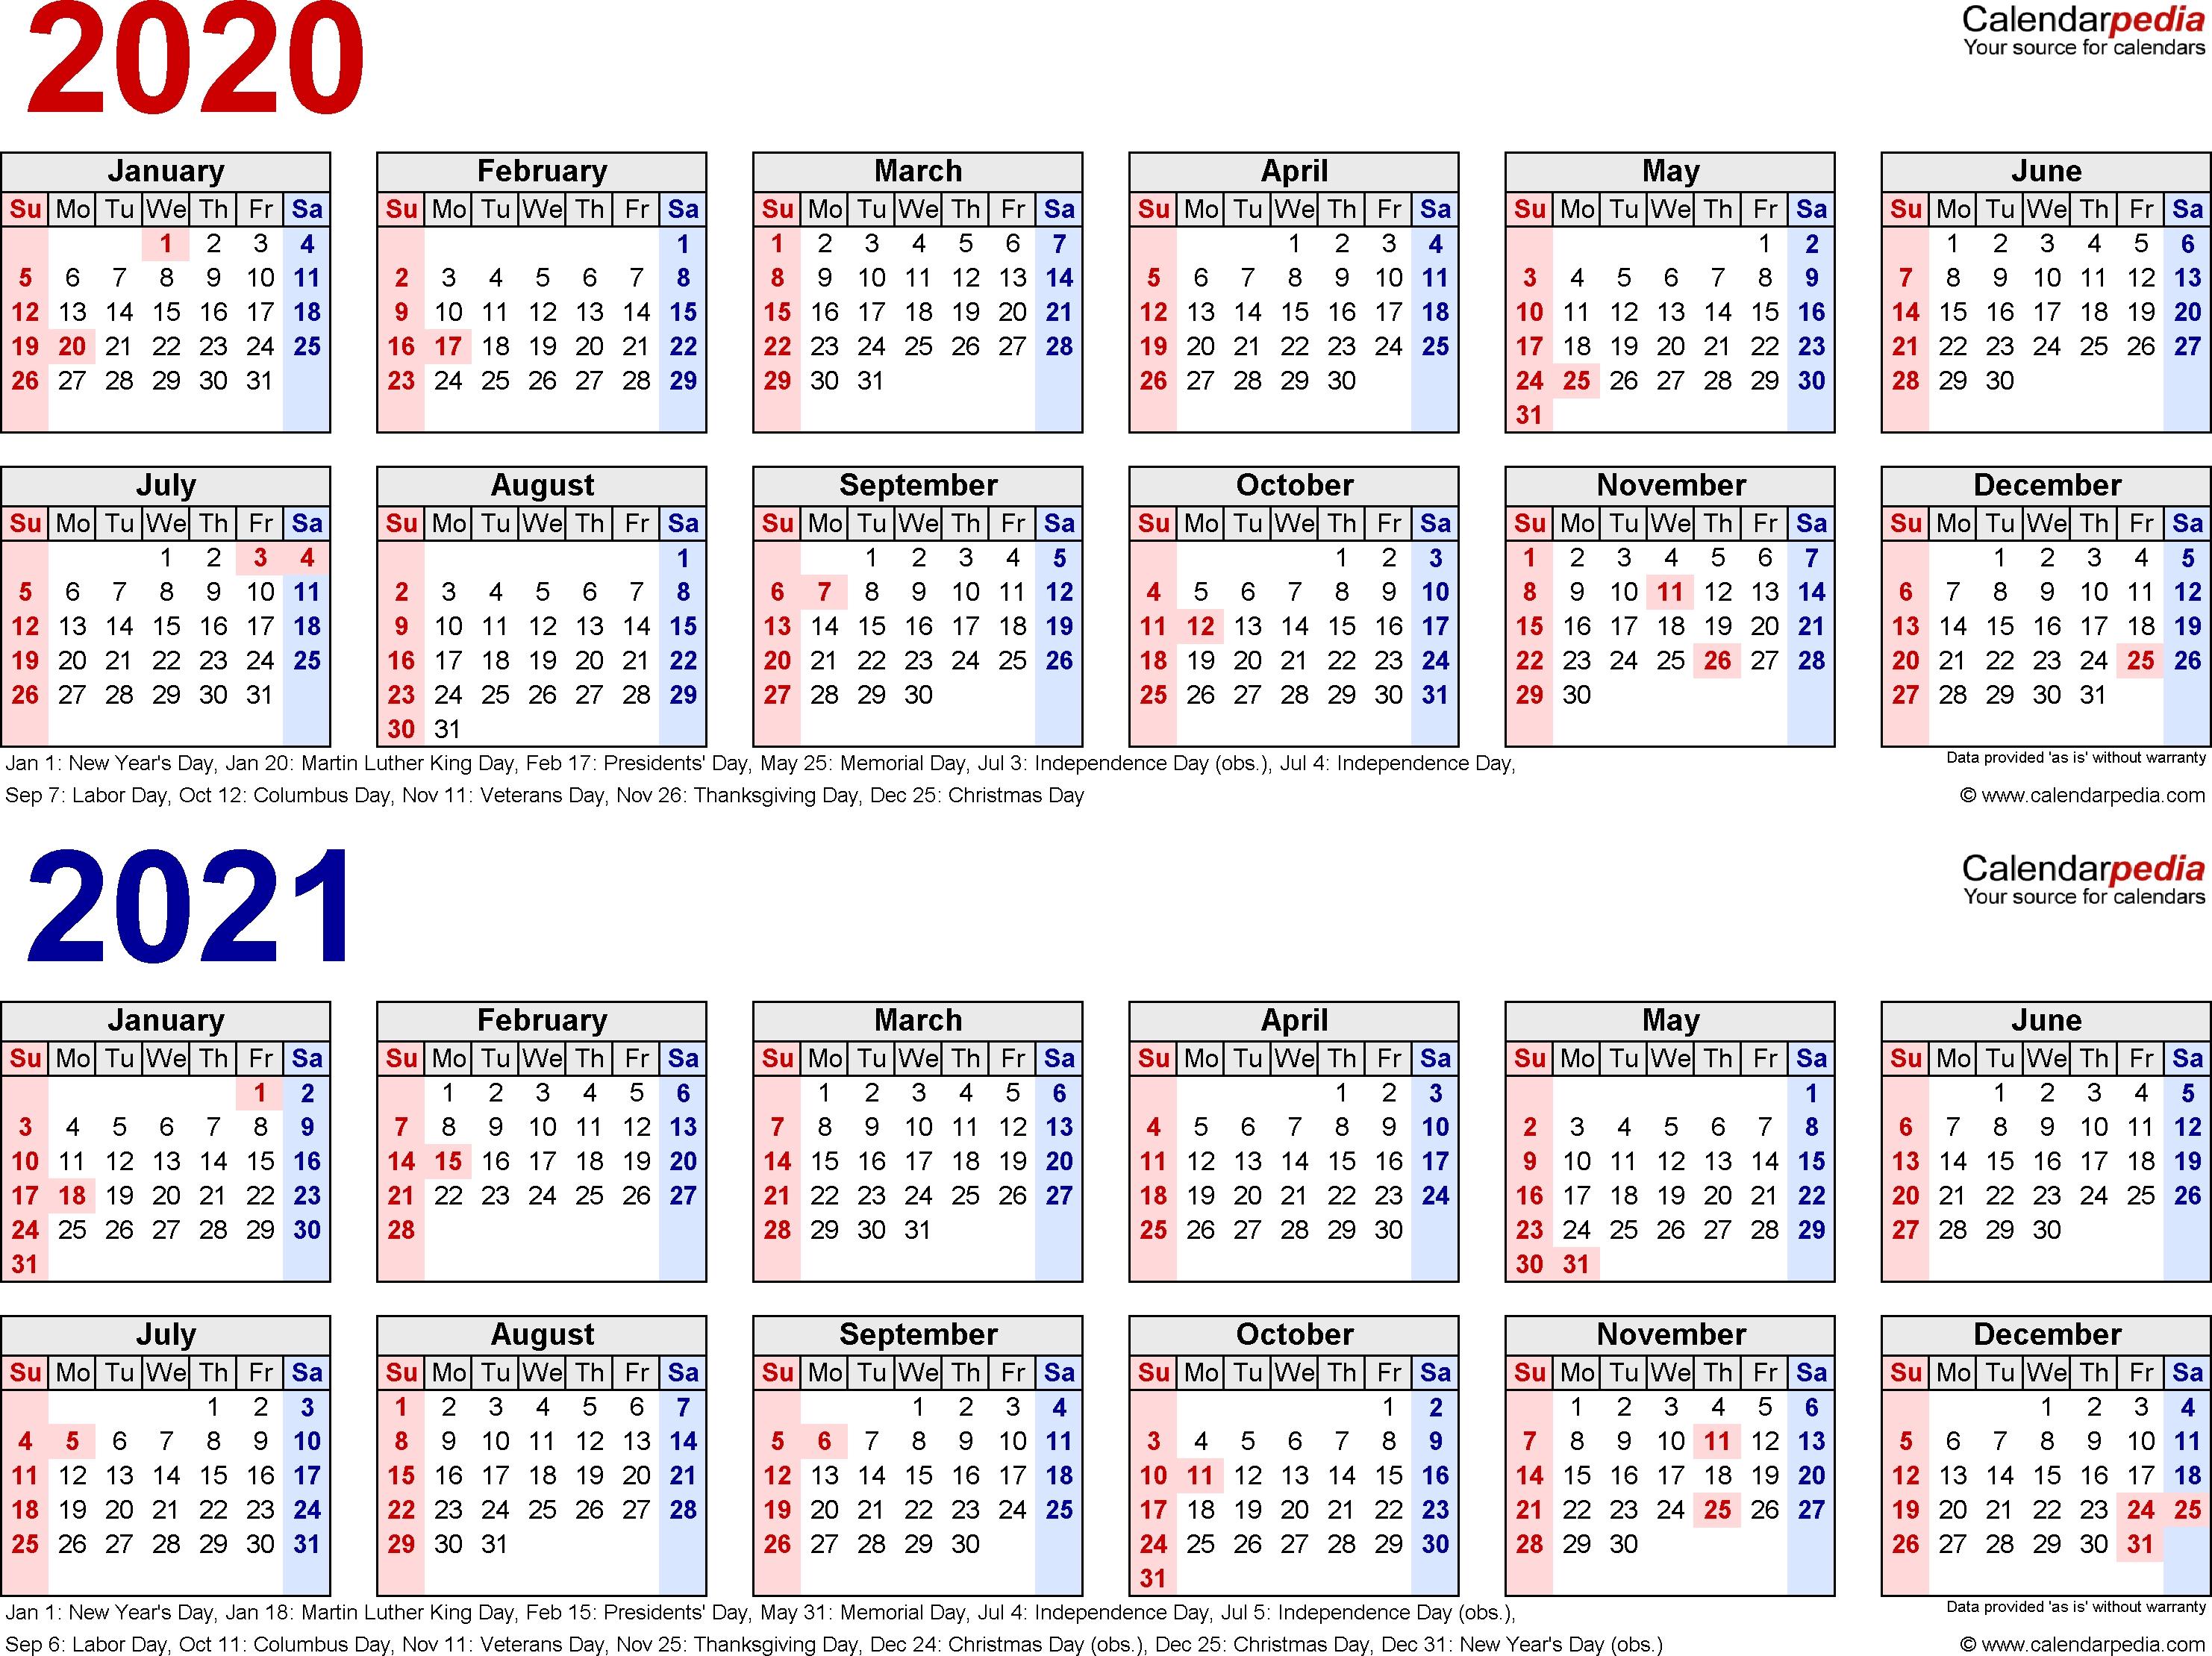 2020-2021 Calendar - Free Printable Two-Year Word Calendars inside Year-Long Calendar 2020 Printable